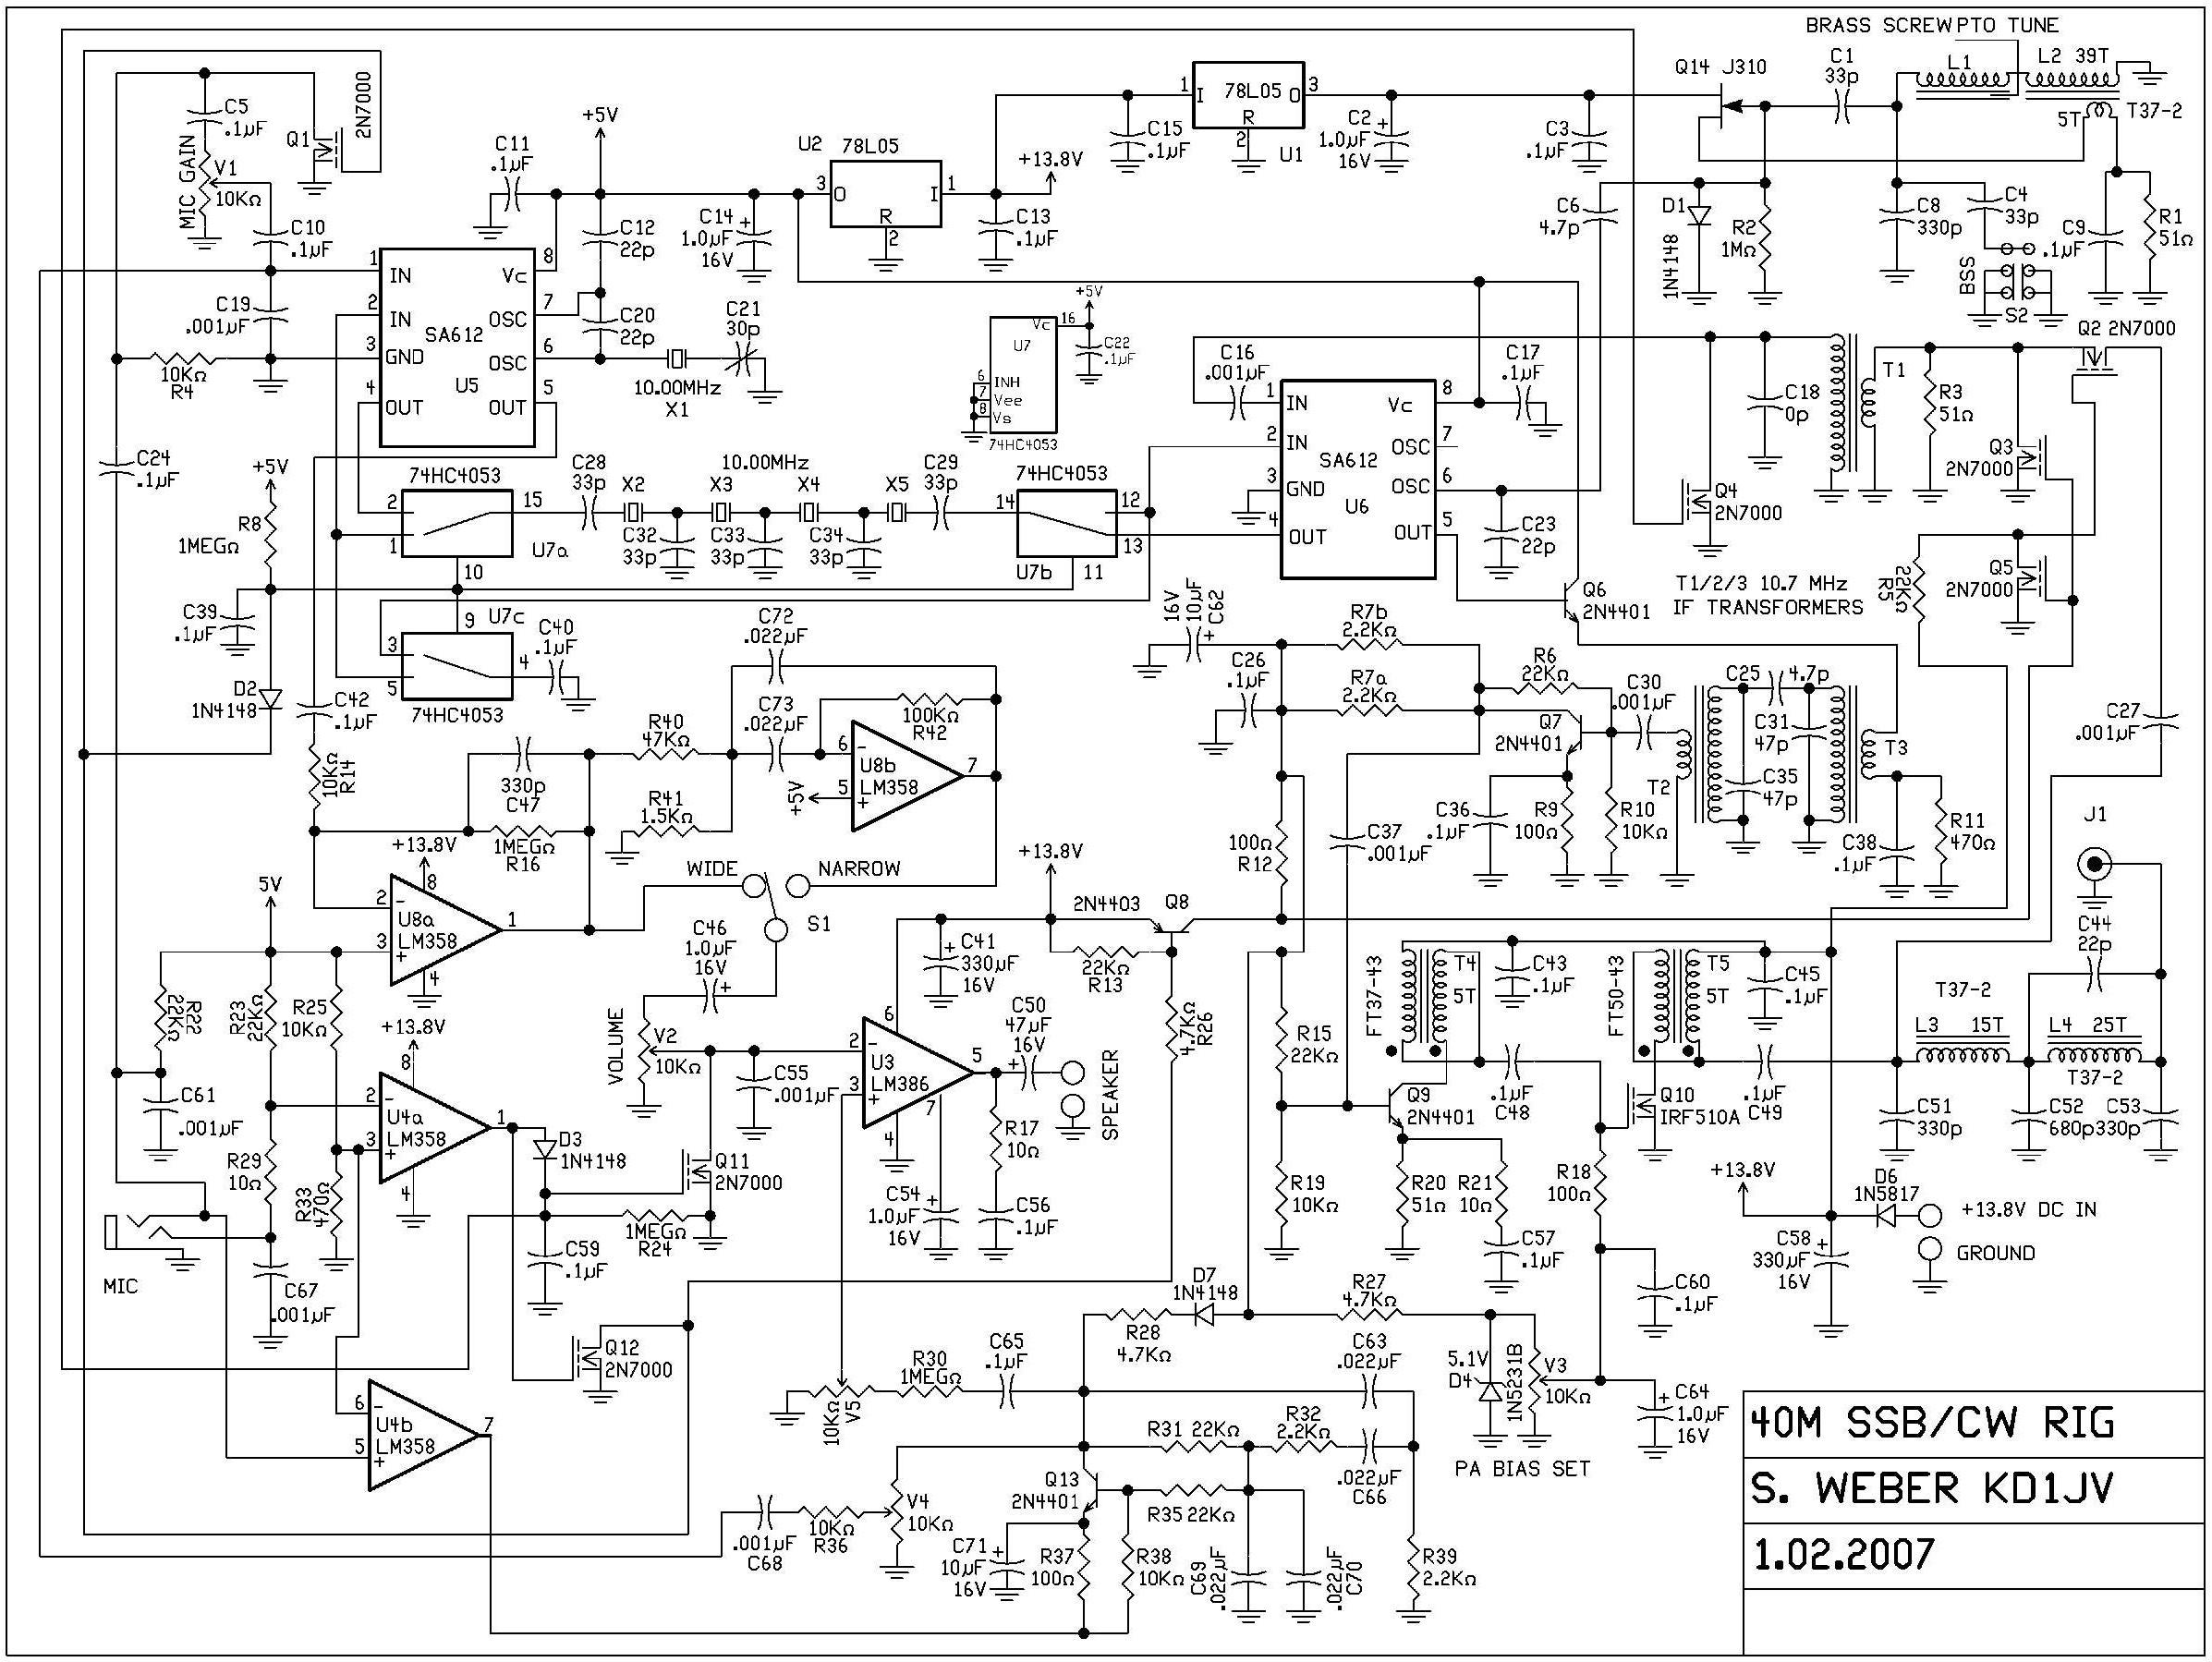 Mmr40 Emetteur Recepteur Blu Cw